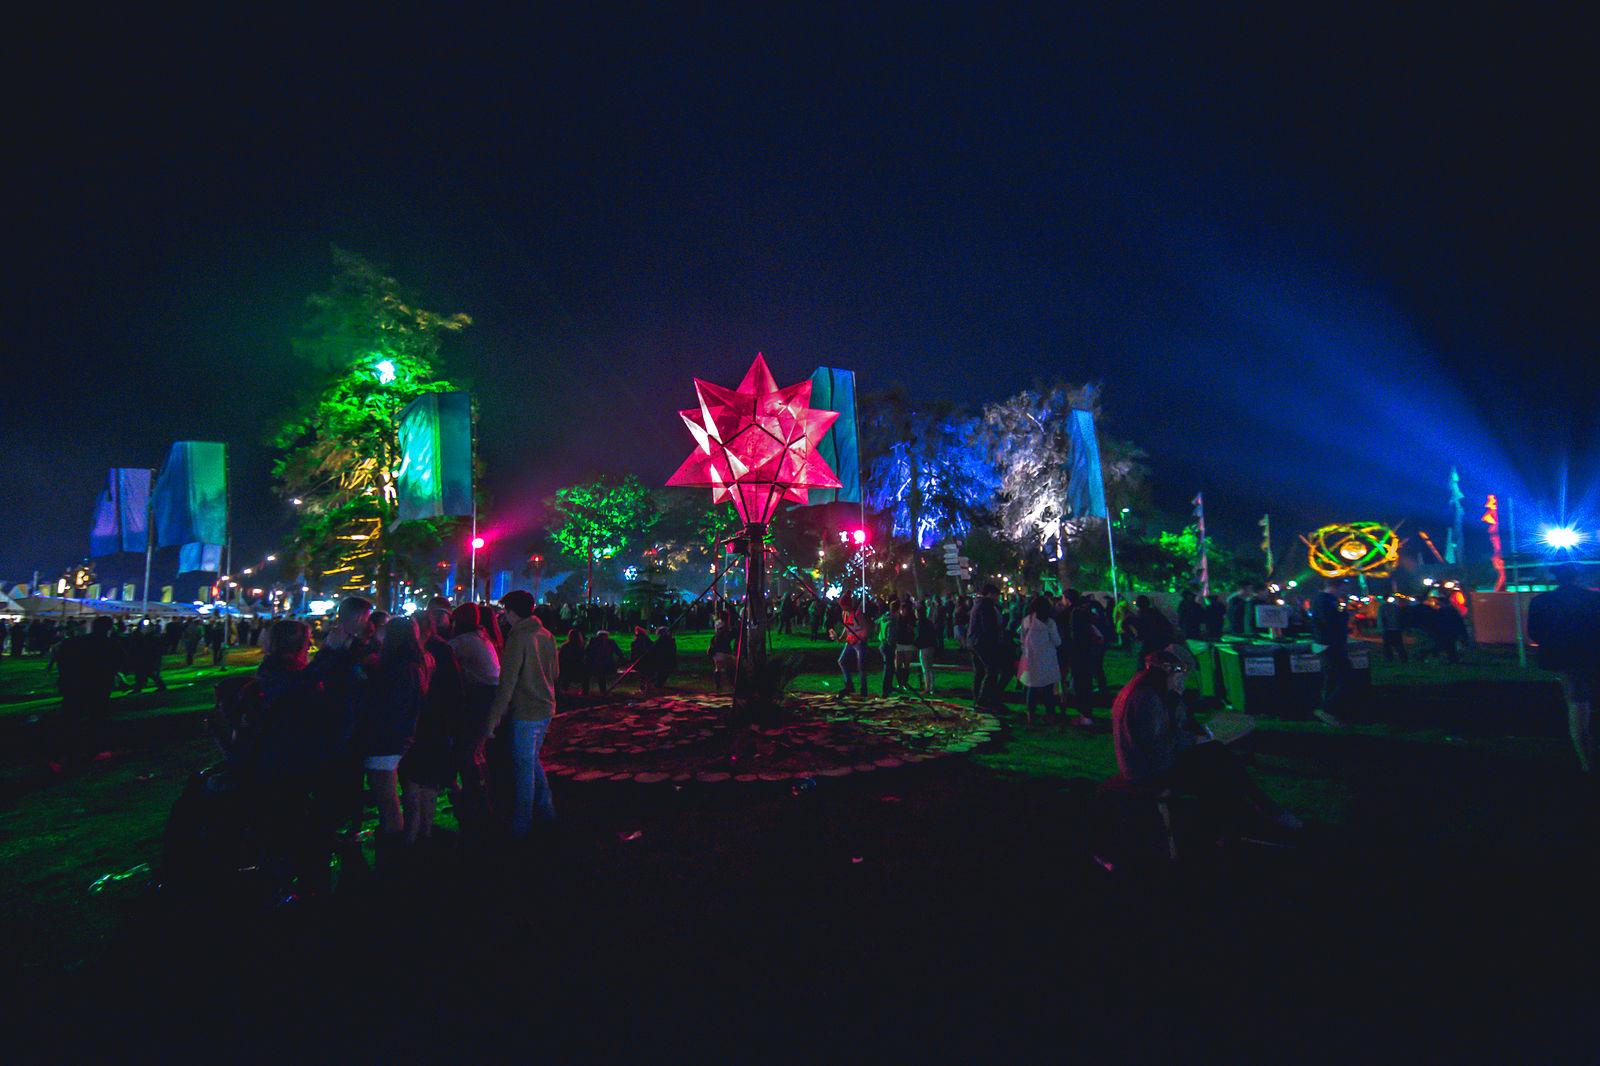 Electric Picnic 2016